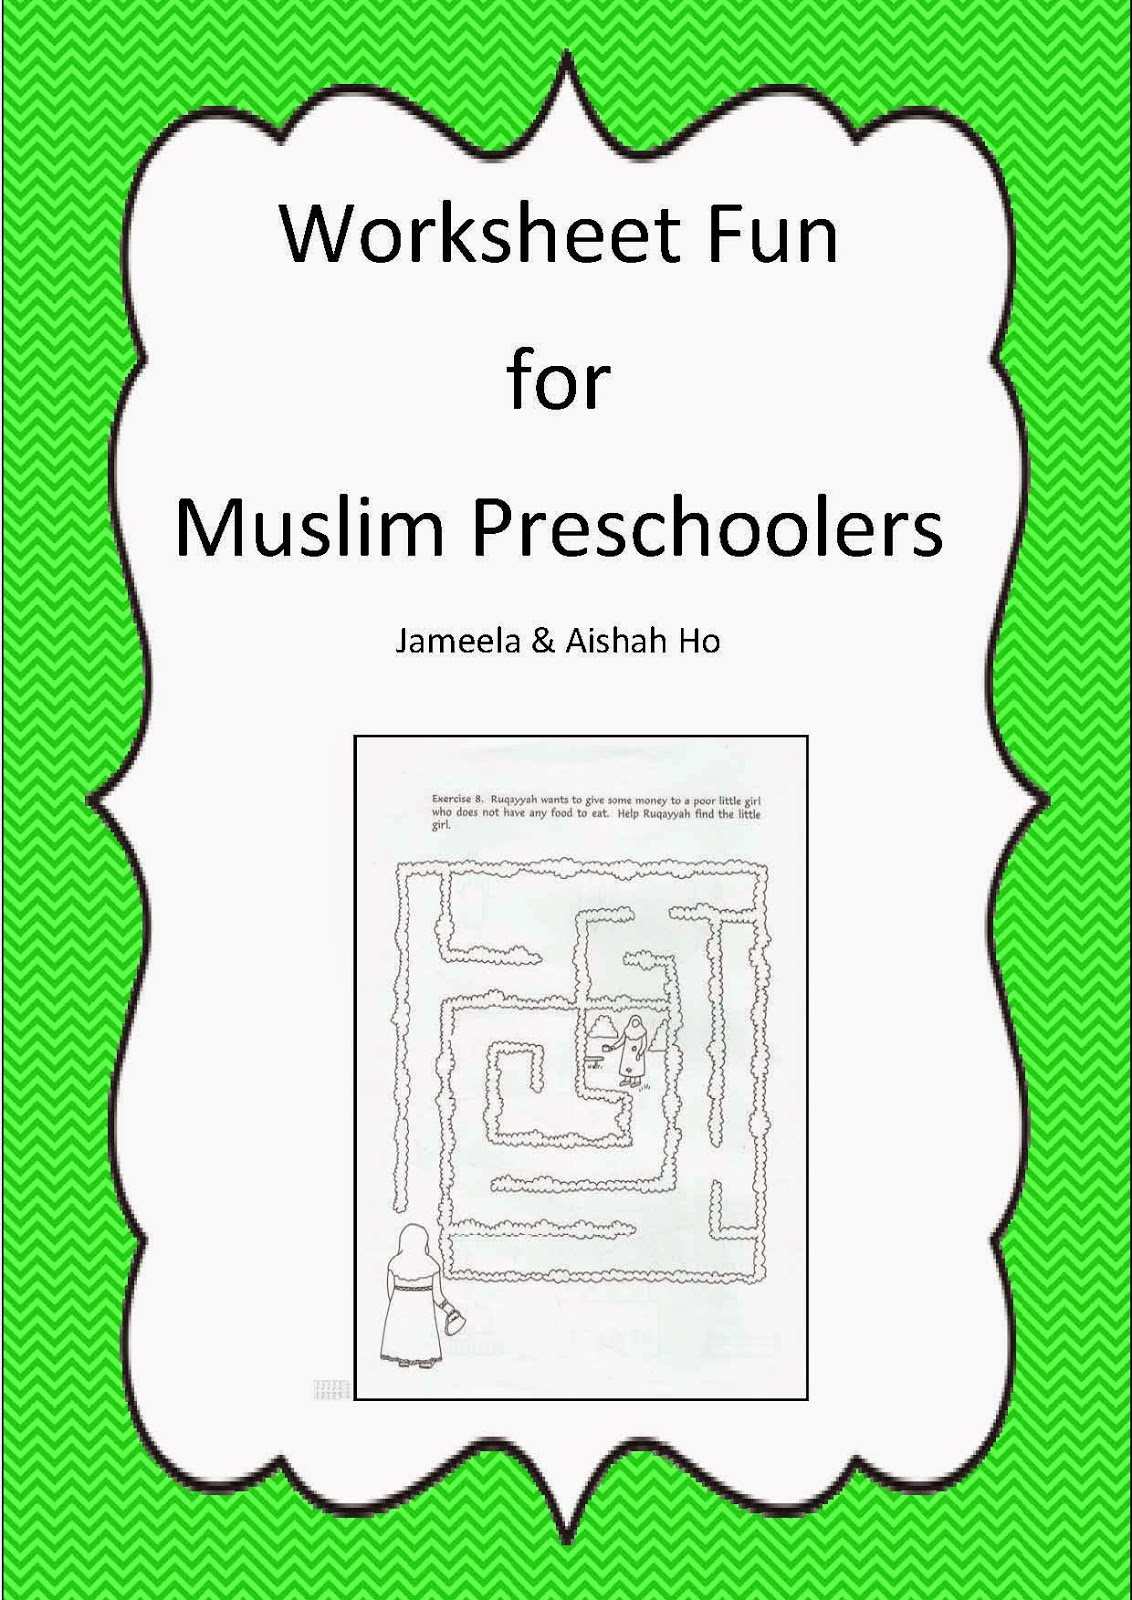 medium resolution of ILMA Education: Free Download: Worksheet Fun for Muslim Preschoolers